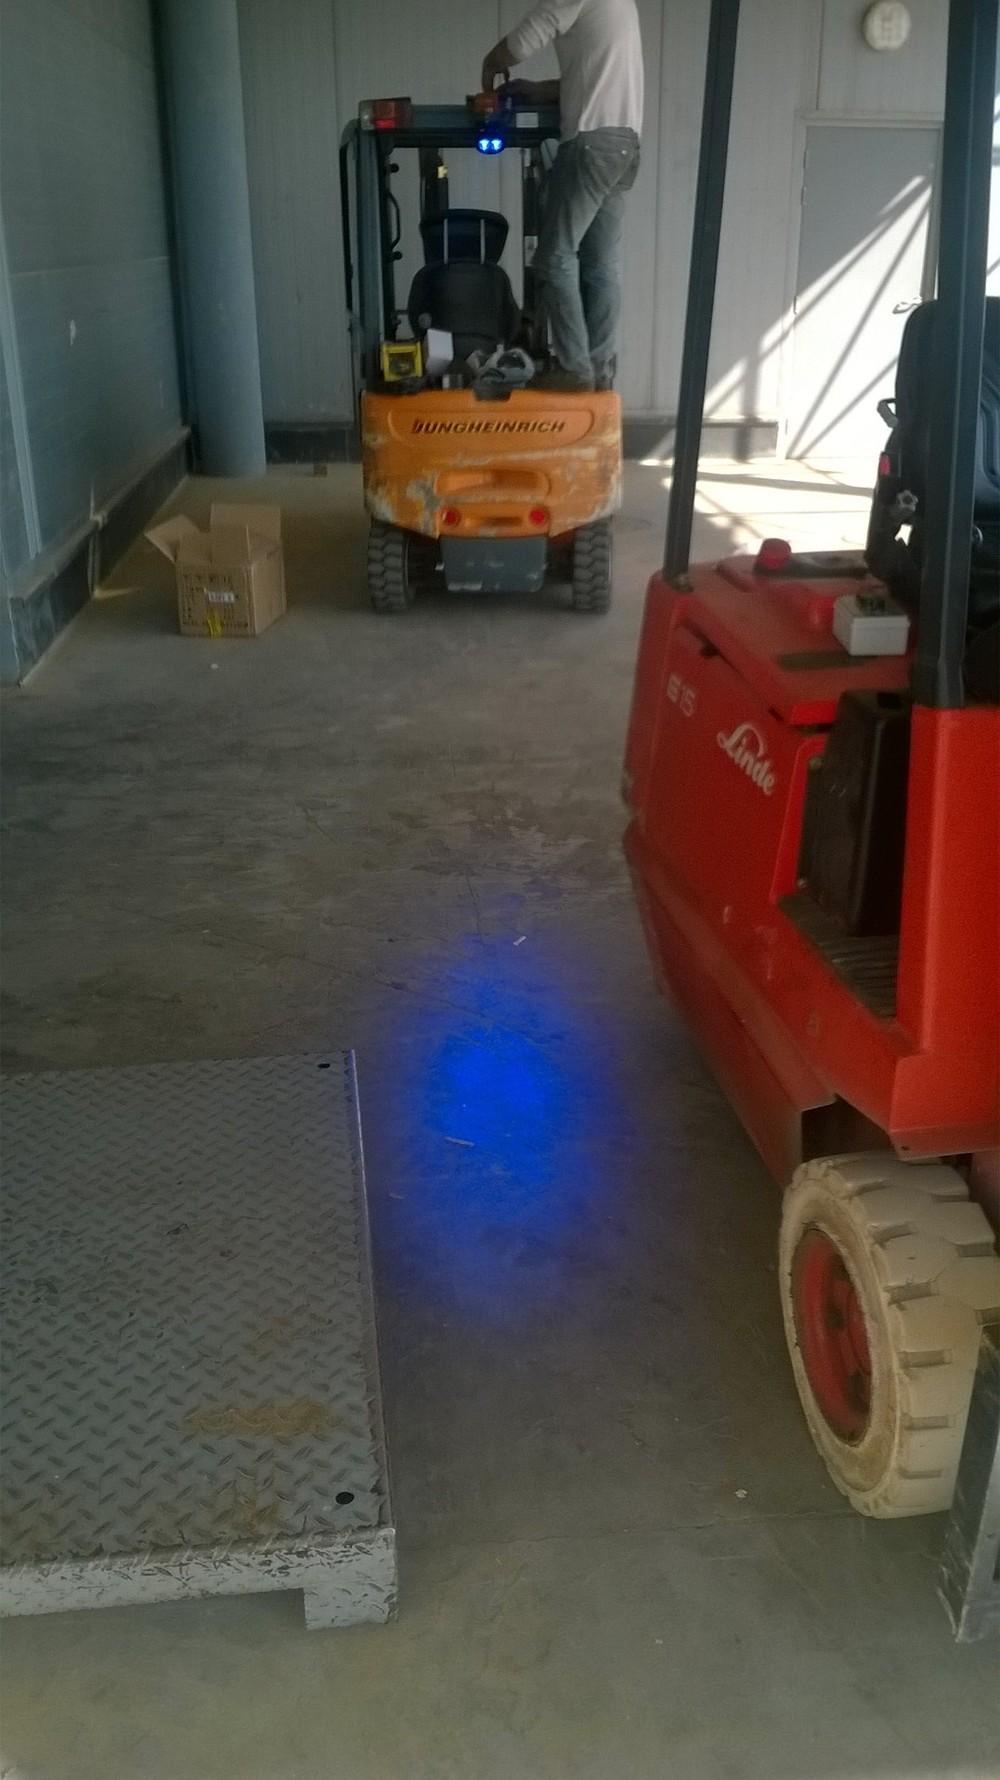 chariot l vateur bluespot bleu led de s curit spotlight lumi re t moin d 39 avertissement syst me. Black Bedroom Furniture Sets. Home Design Ideas